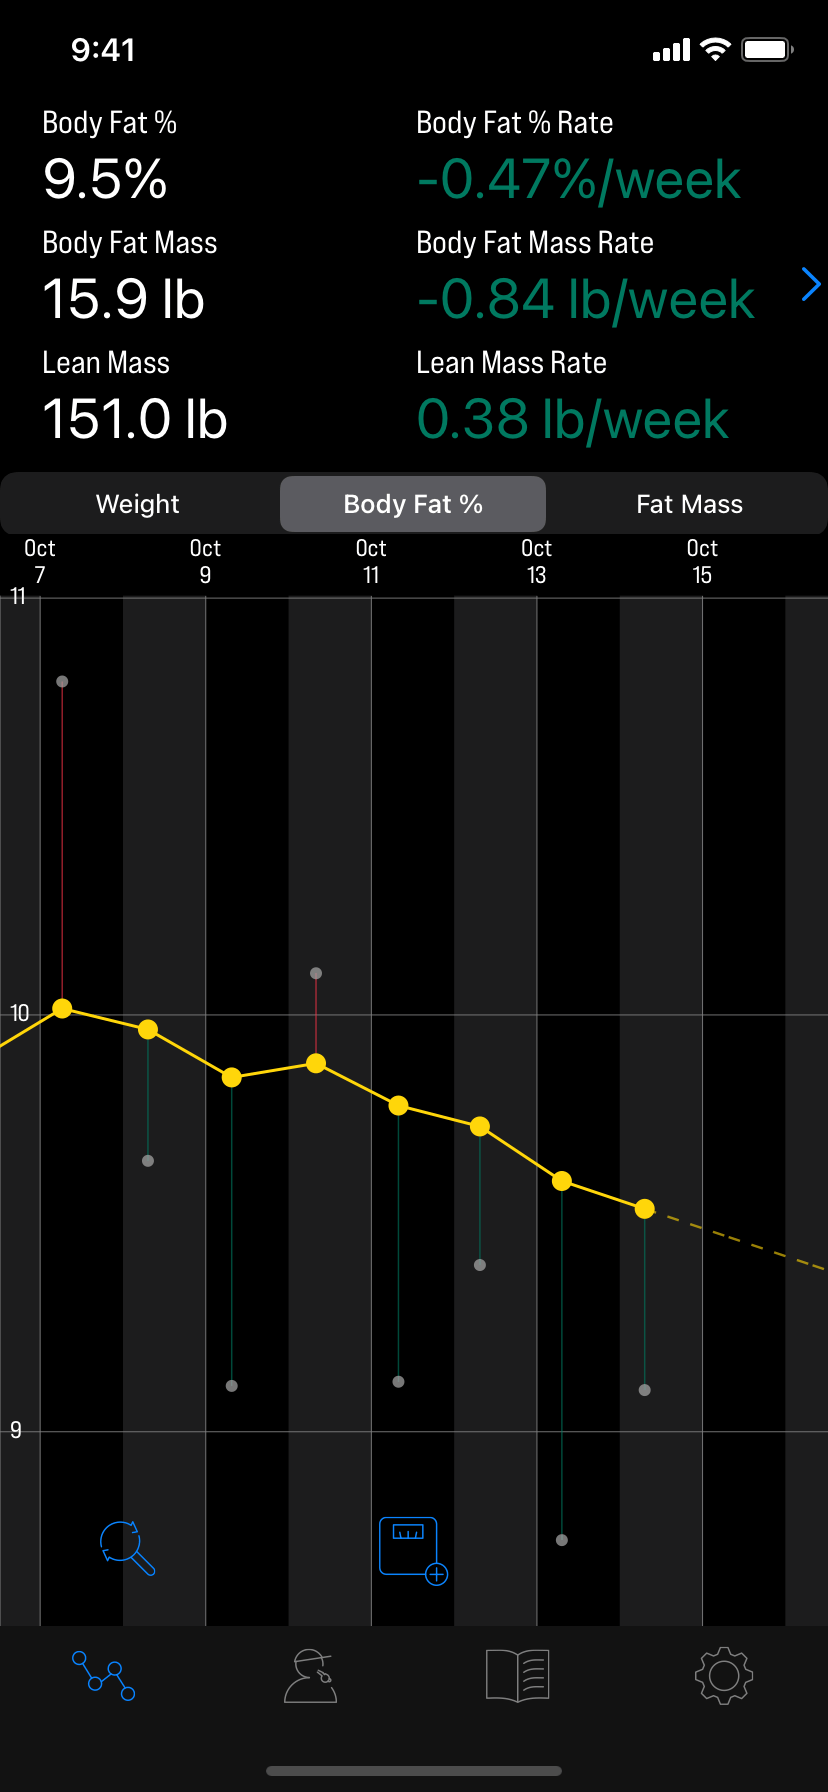 luuze weight loss coach - body fat measurements